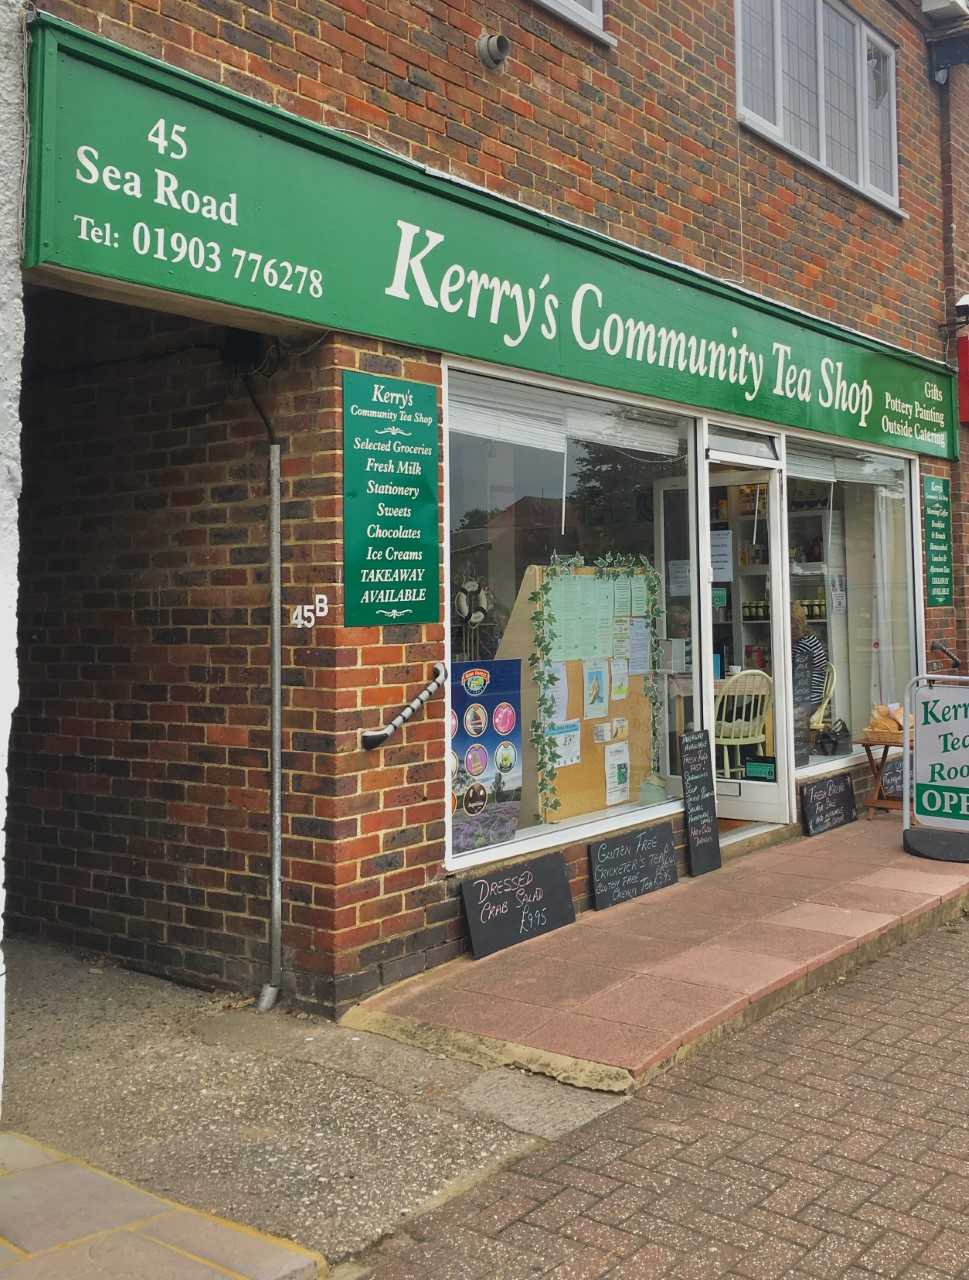 Kerry's Community Tea Shop in East Preston (1)